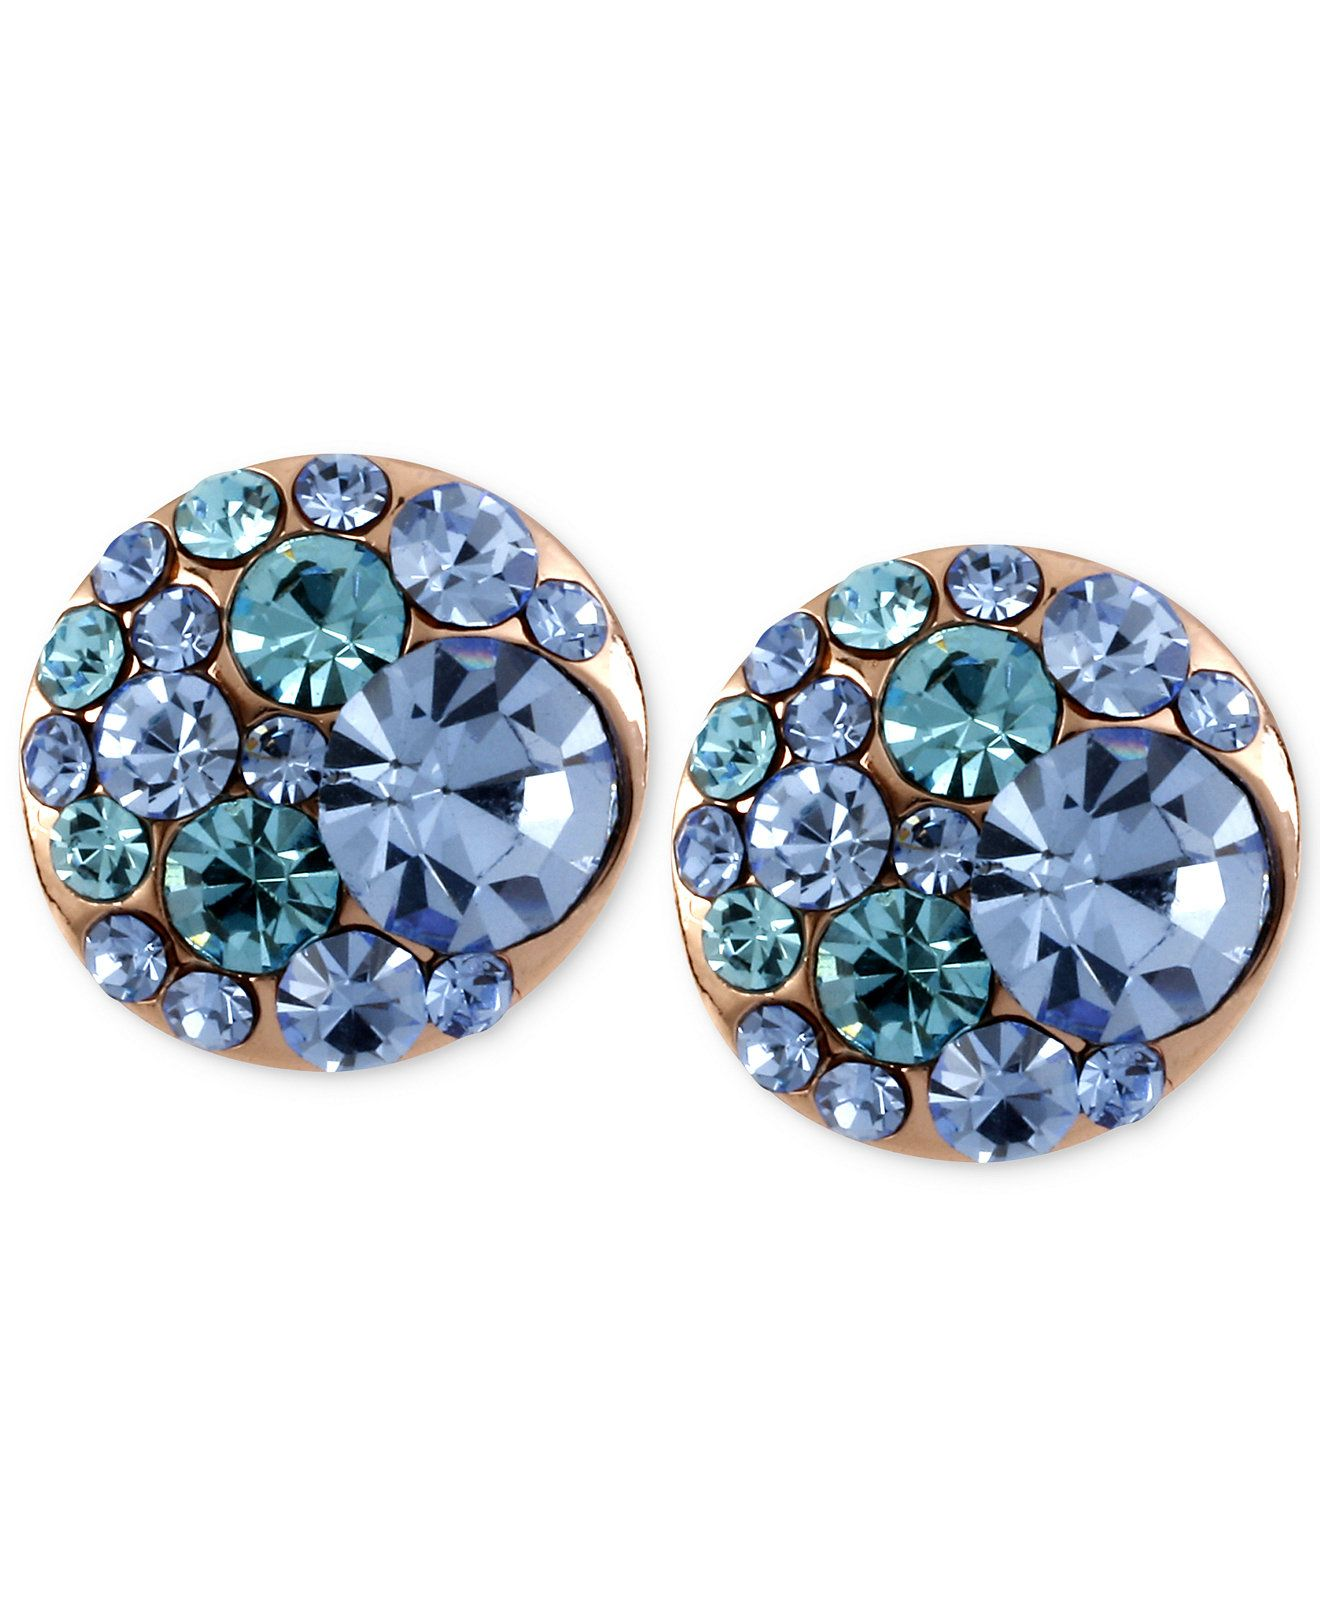 Betsey Johnson Rose GoldTone Blue Crystal Stud Earrings Blue